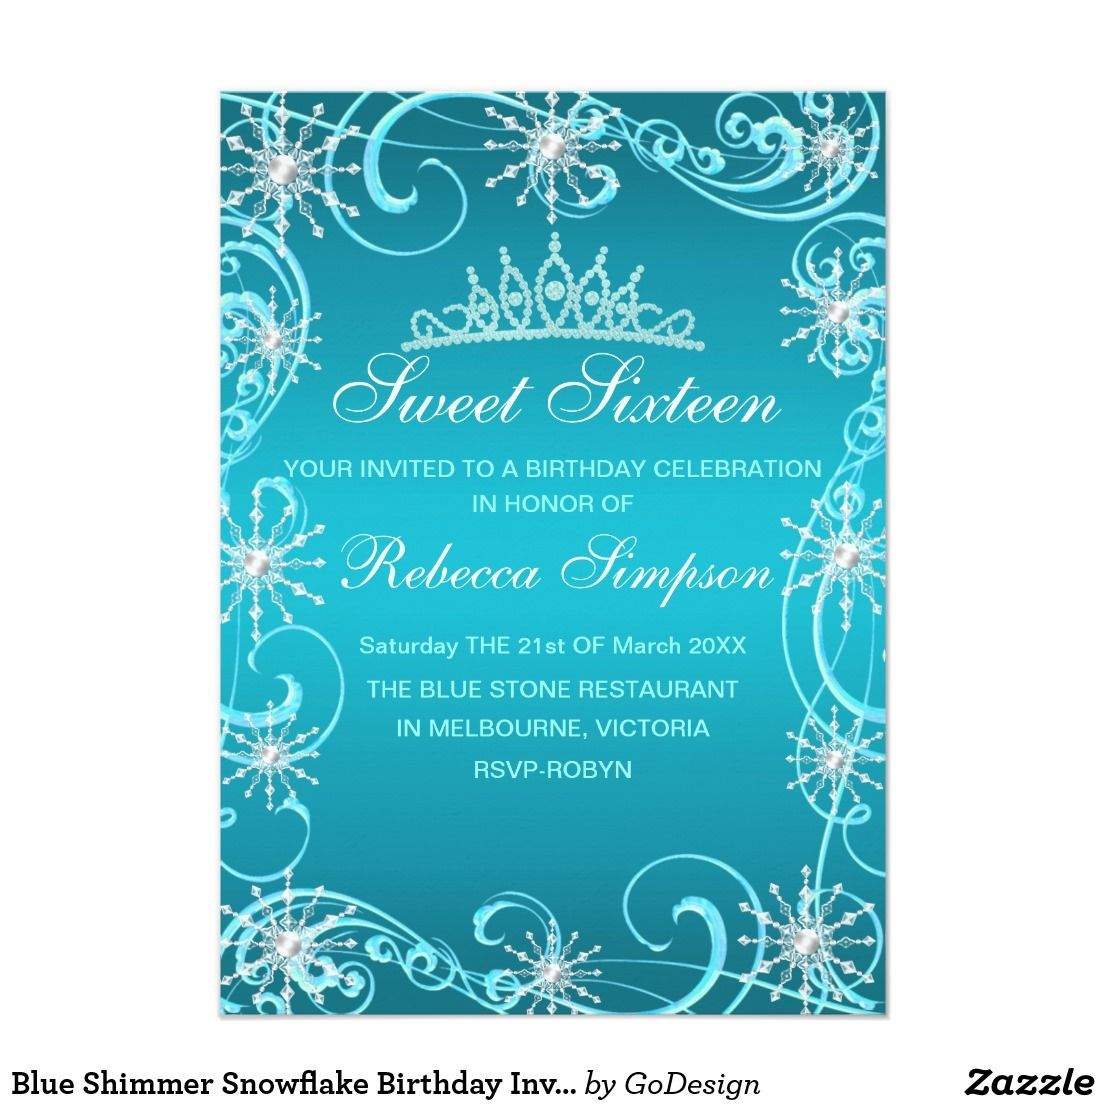 blue shimmer snowflake birthday invite